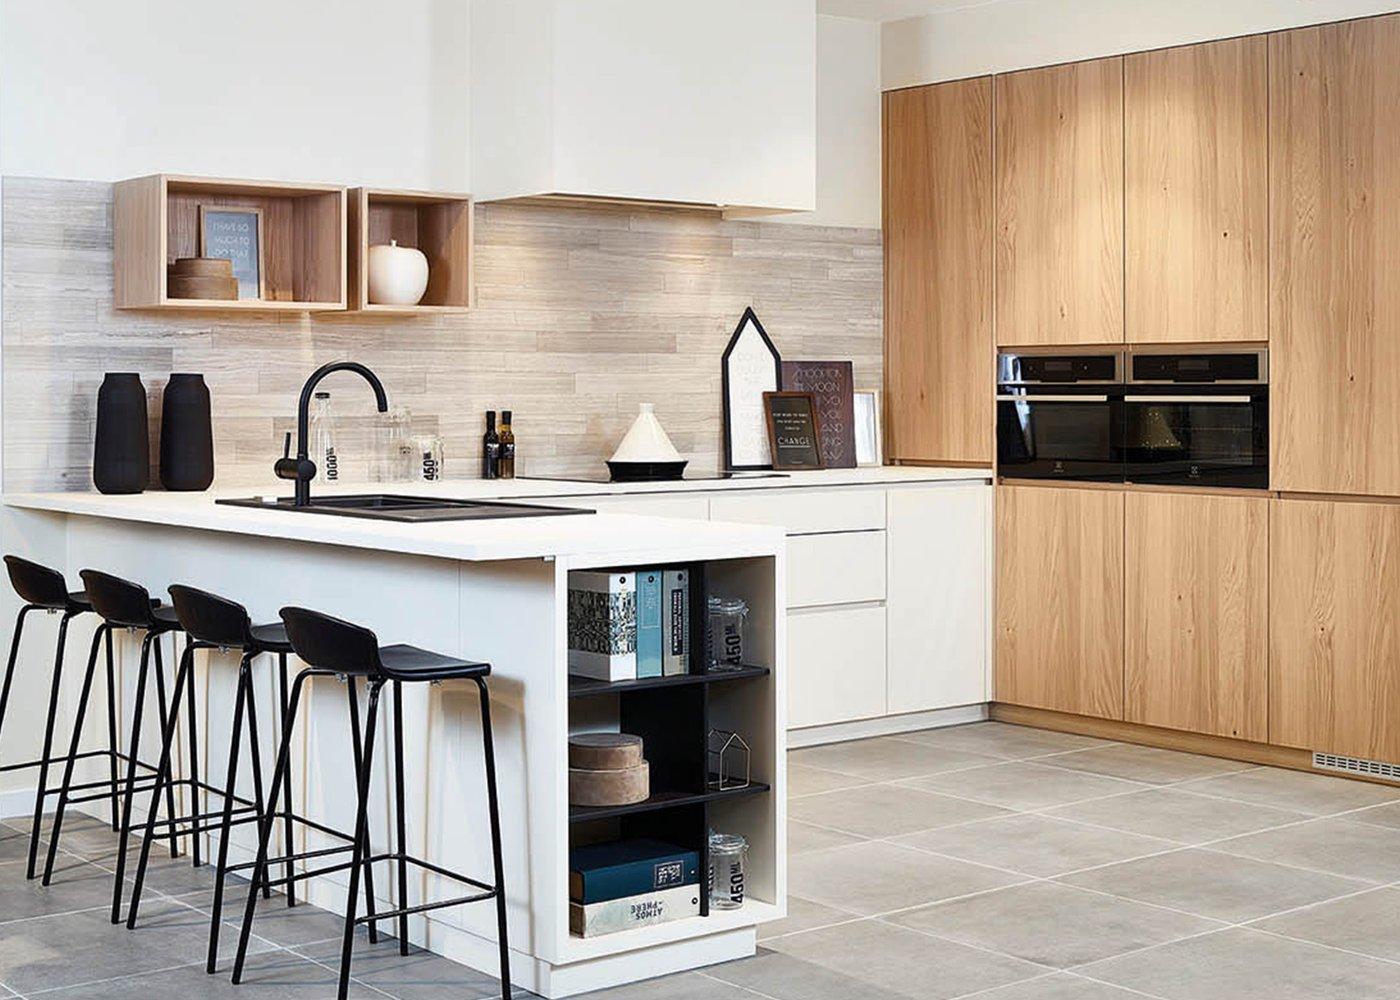 Moderne keuken met wand in fineer eik - Model Design